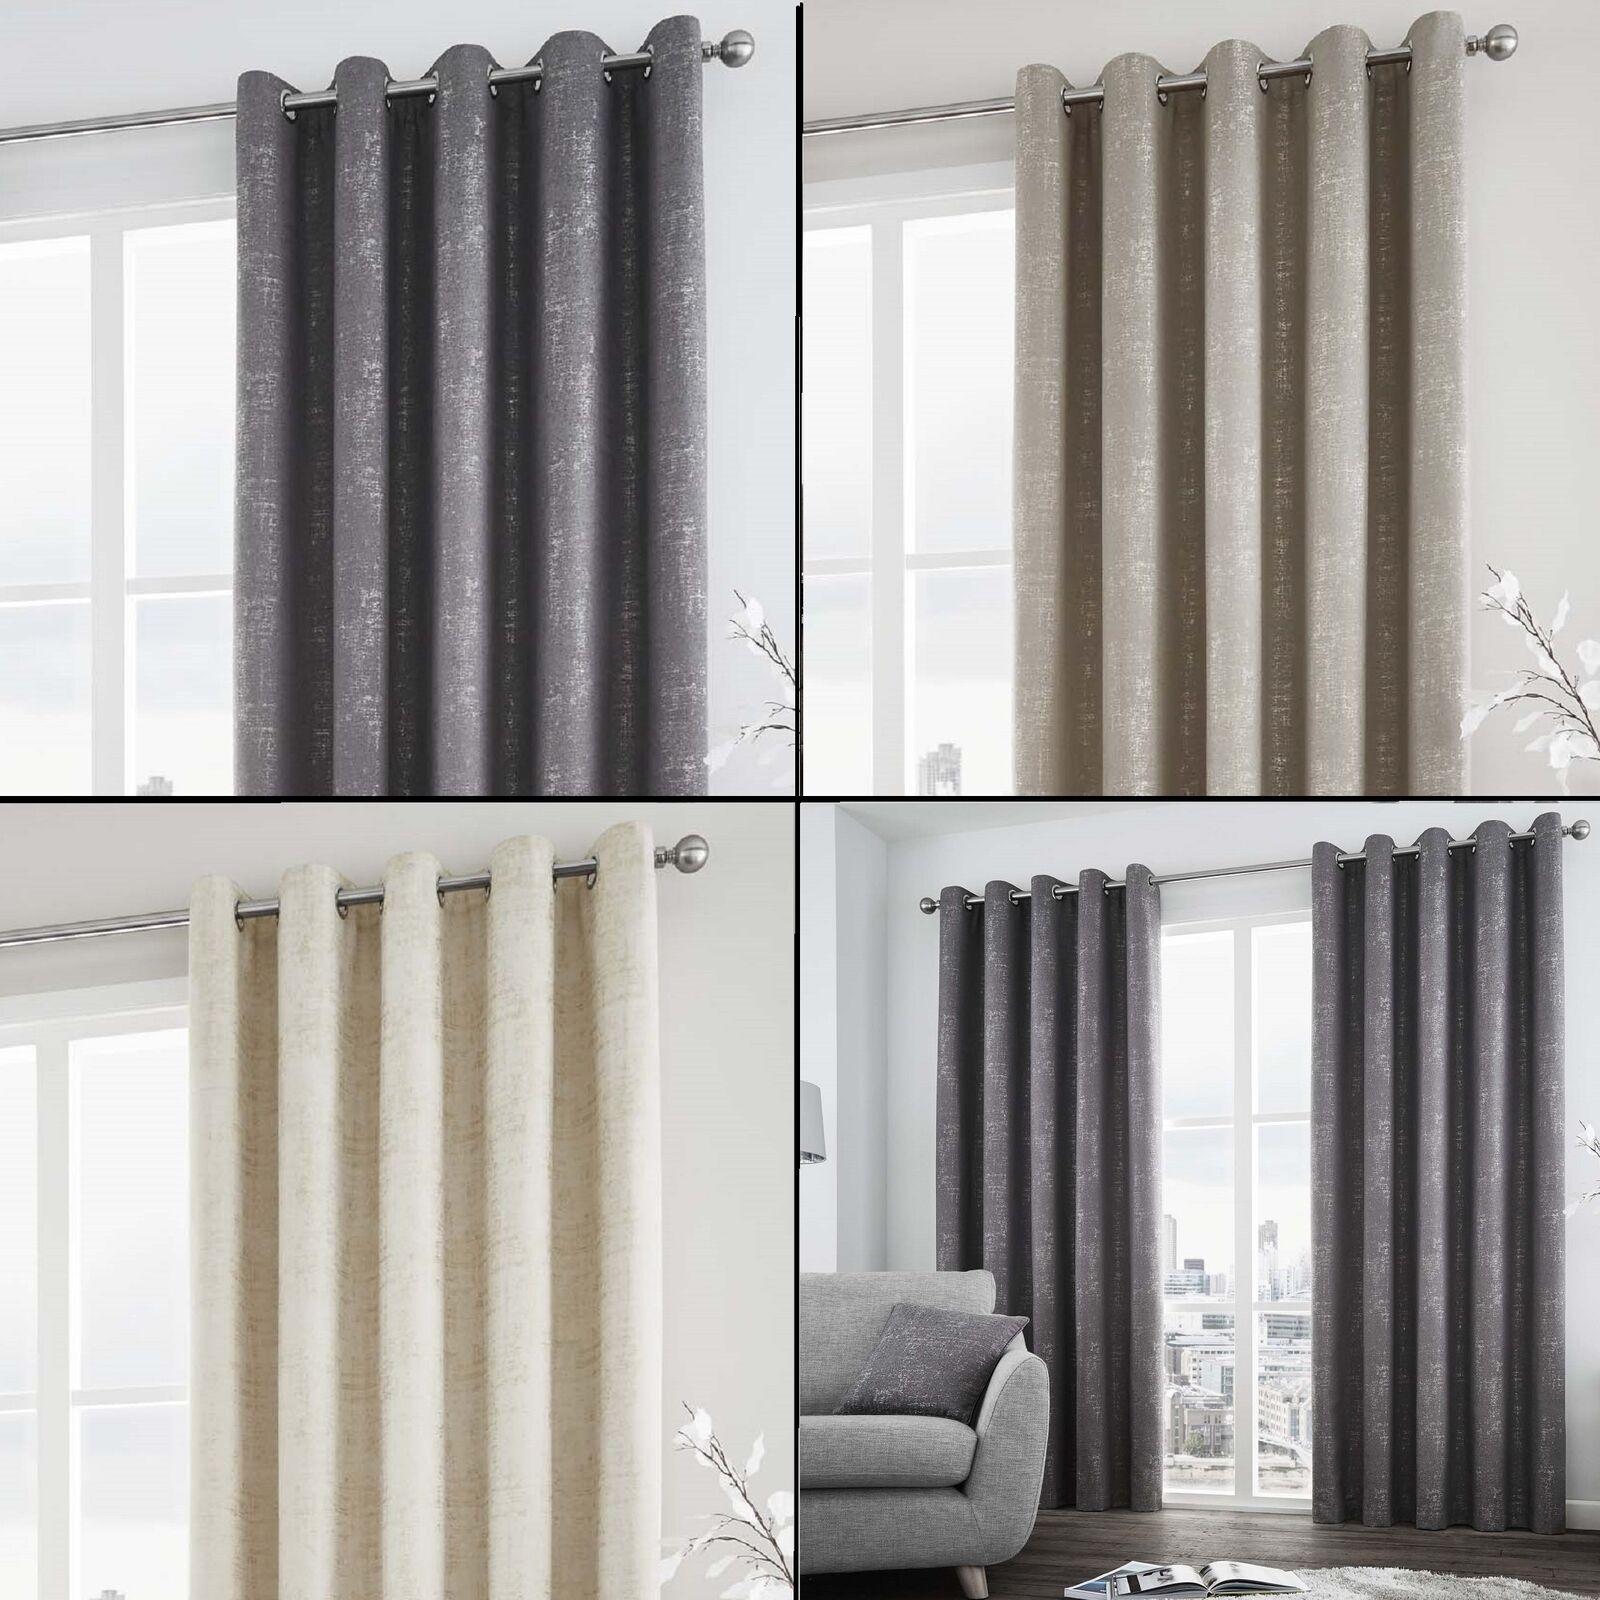 Cortinas DE ORIFICIOS FORRADAS Solent Con Tonos Metálico Plateado-gris Crema